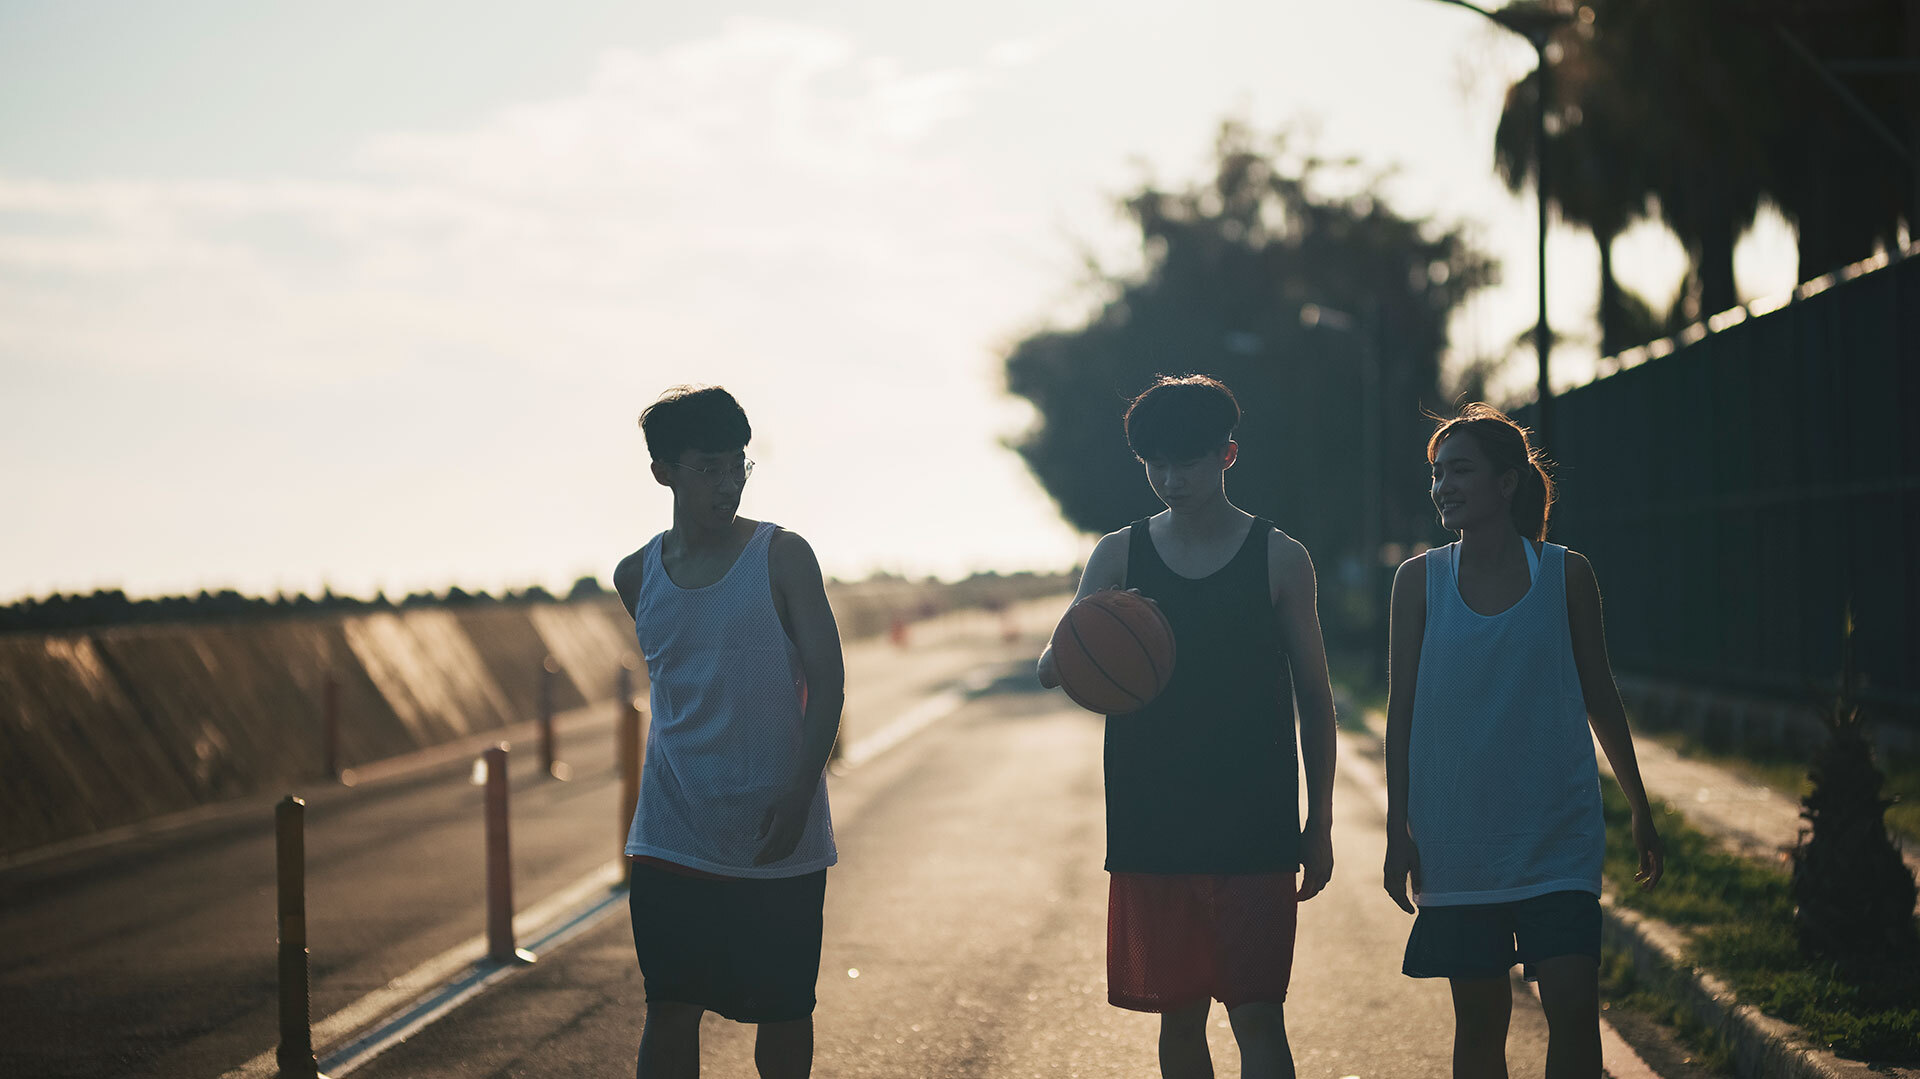 Three youth playing basketball